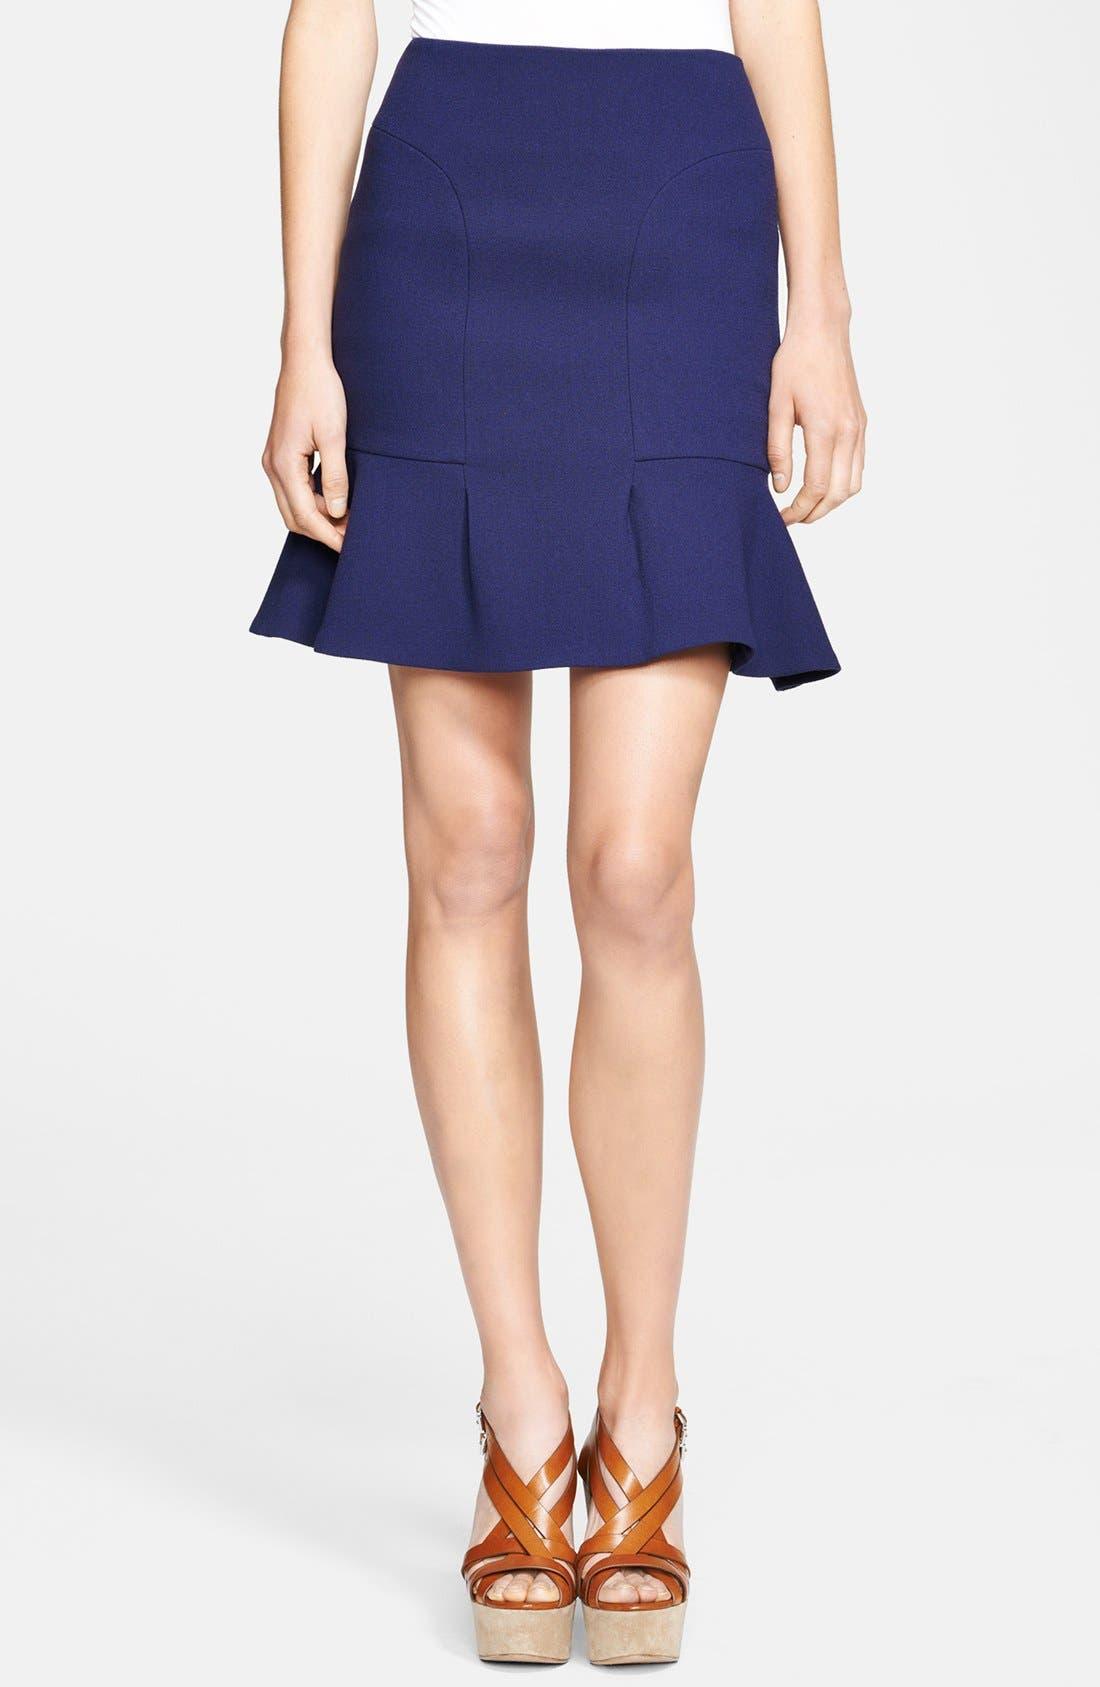 Main Image - Michael Kors Bouclé Stretch Wool Skirt